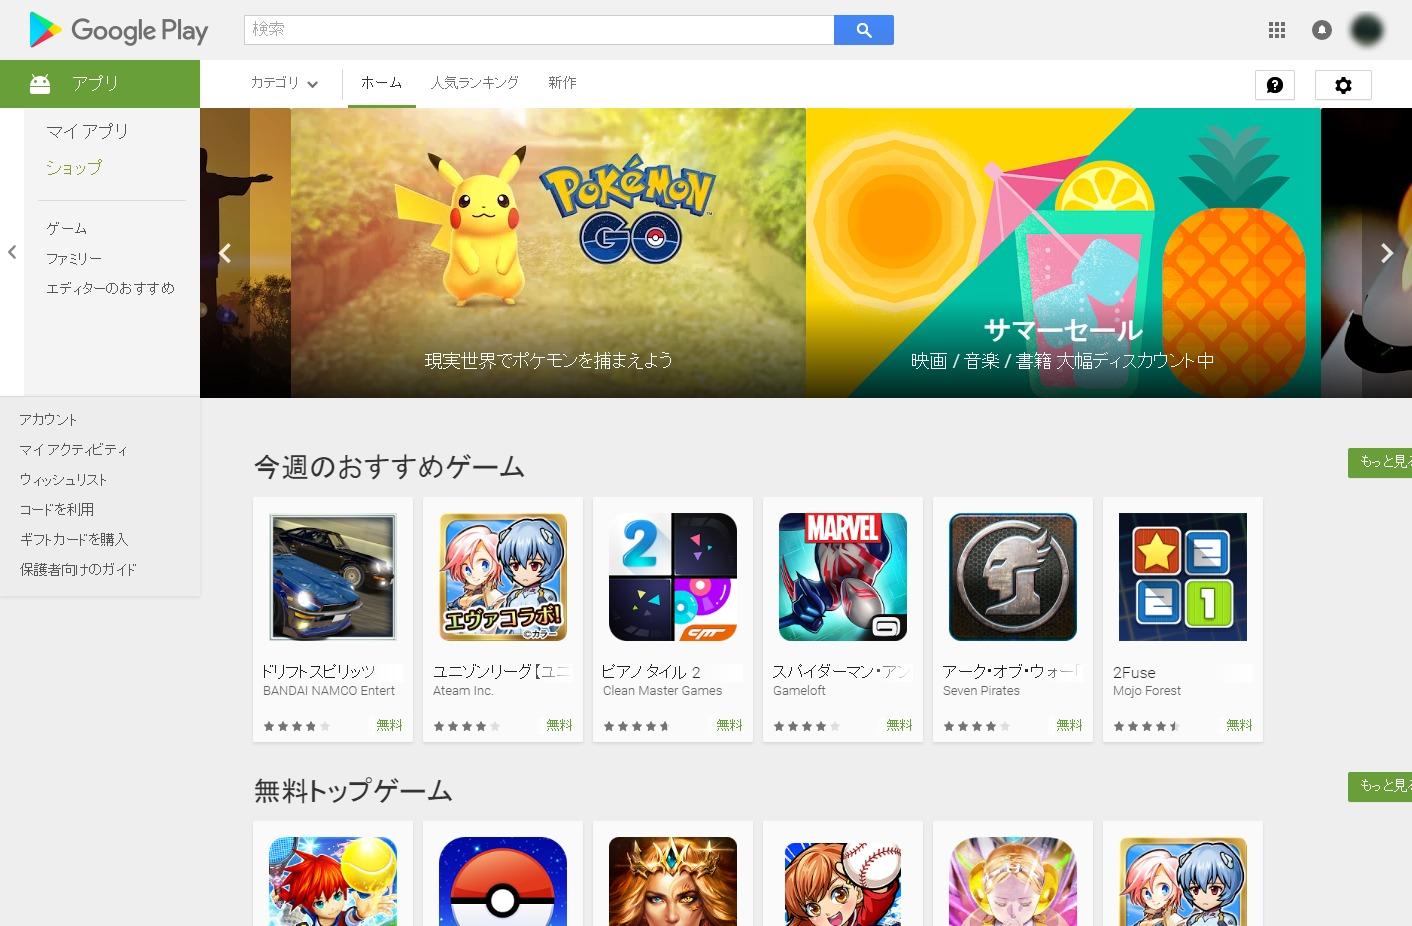 Google Play Webpage